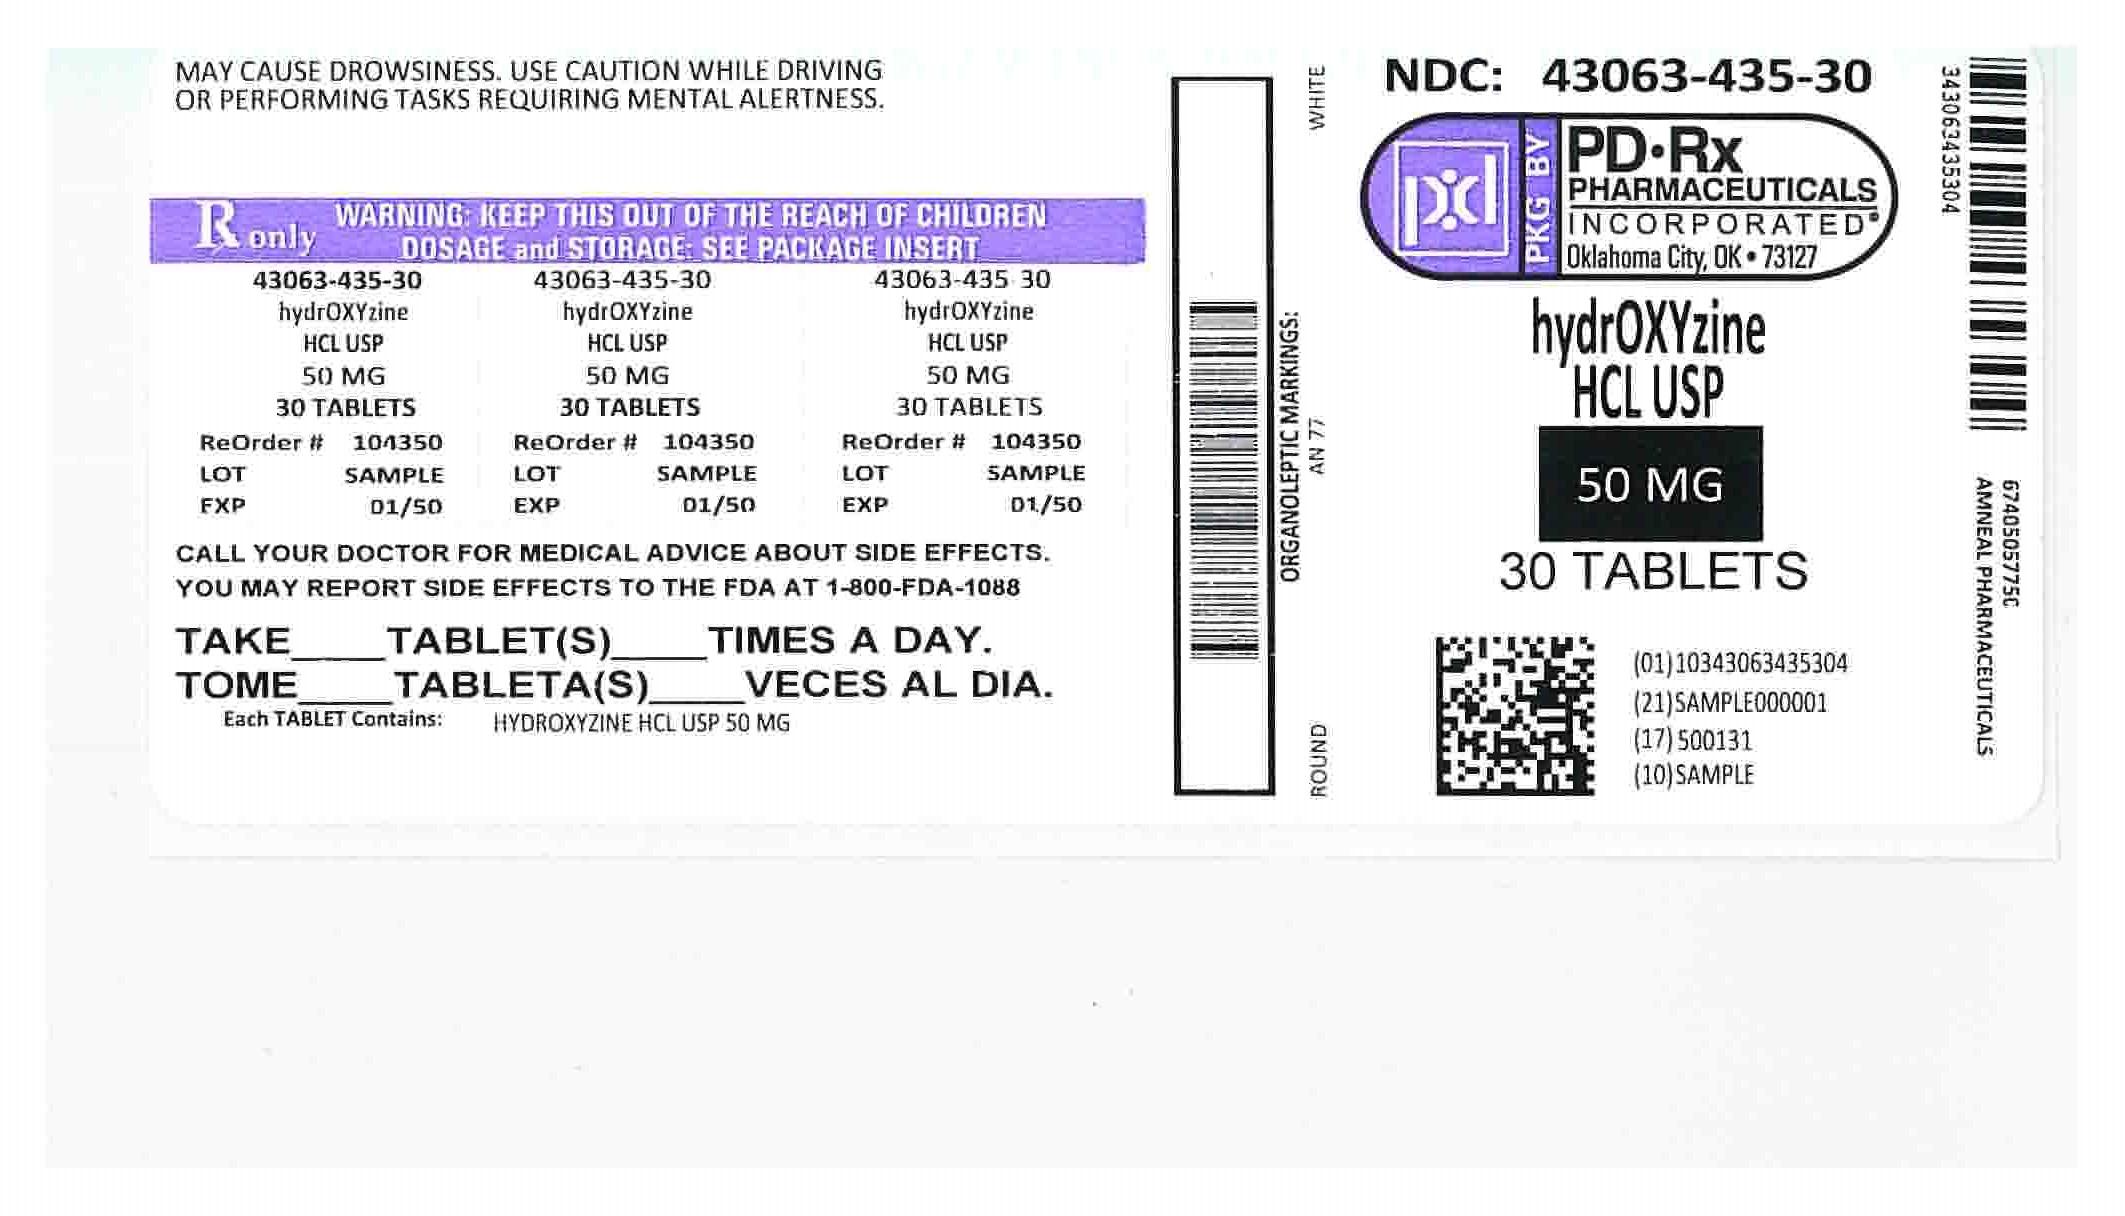 43063435 Label